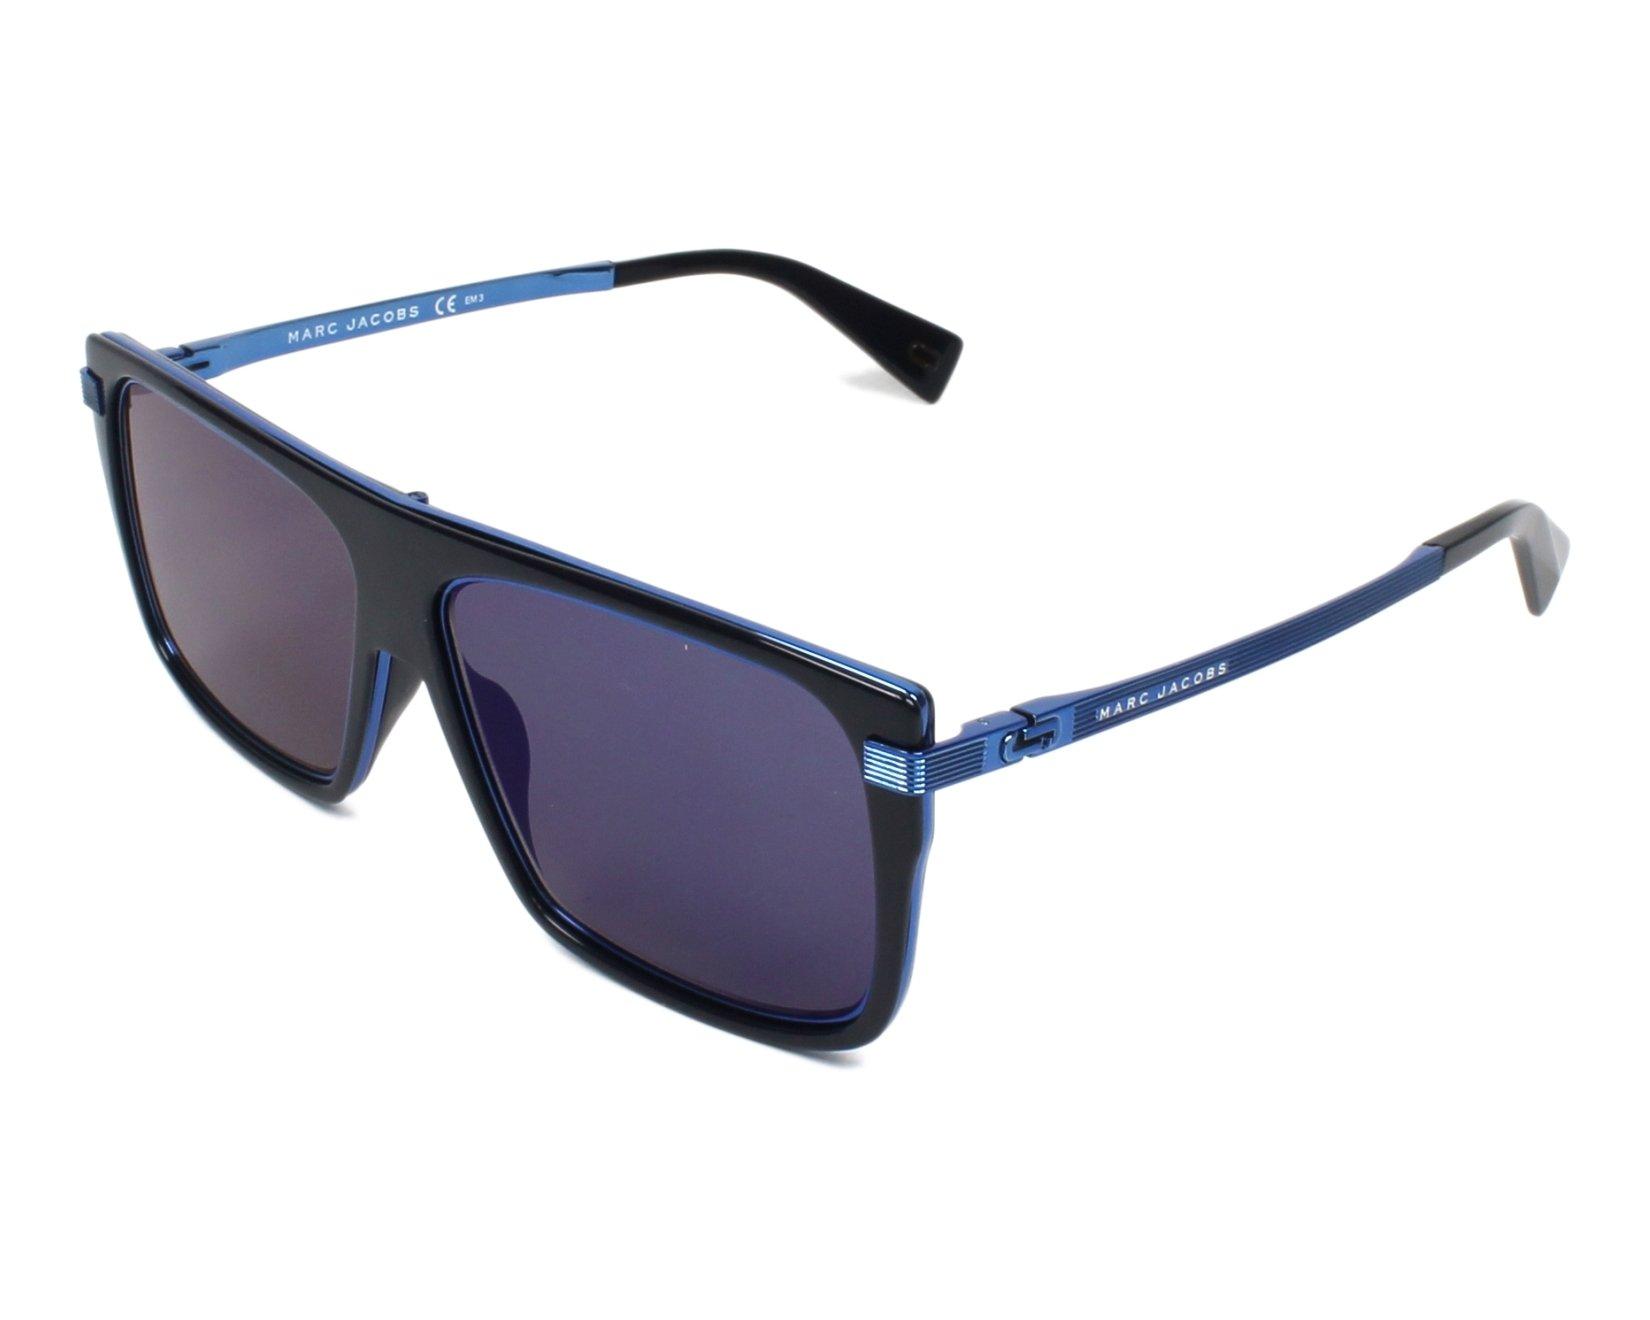 ... Sunglasses Marc Jacobs MARC-242-S PJPXT 59-14 Blue Blue on feet ... 35c0edce7fae